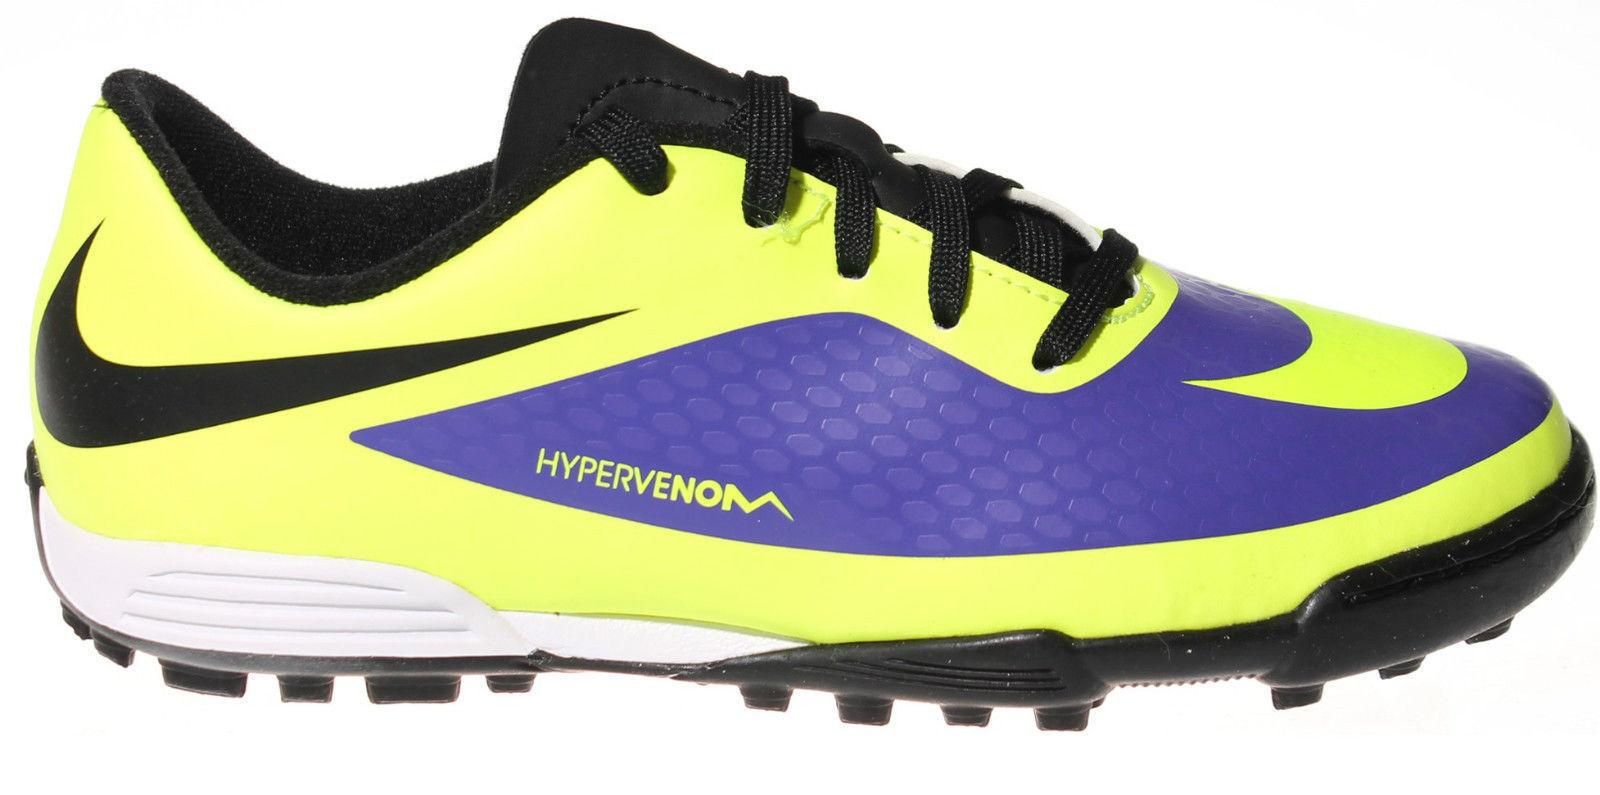 FW14 Nike Mercurial Hypervenom Phade Tf botas Jr botas Fútbol Sala 599813 570